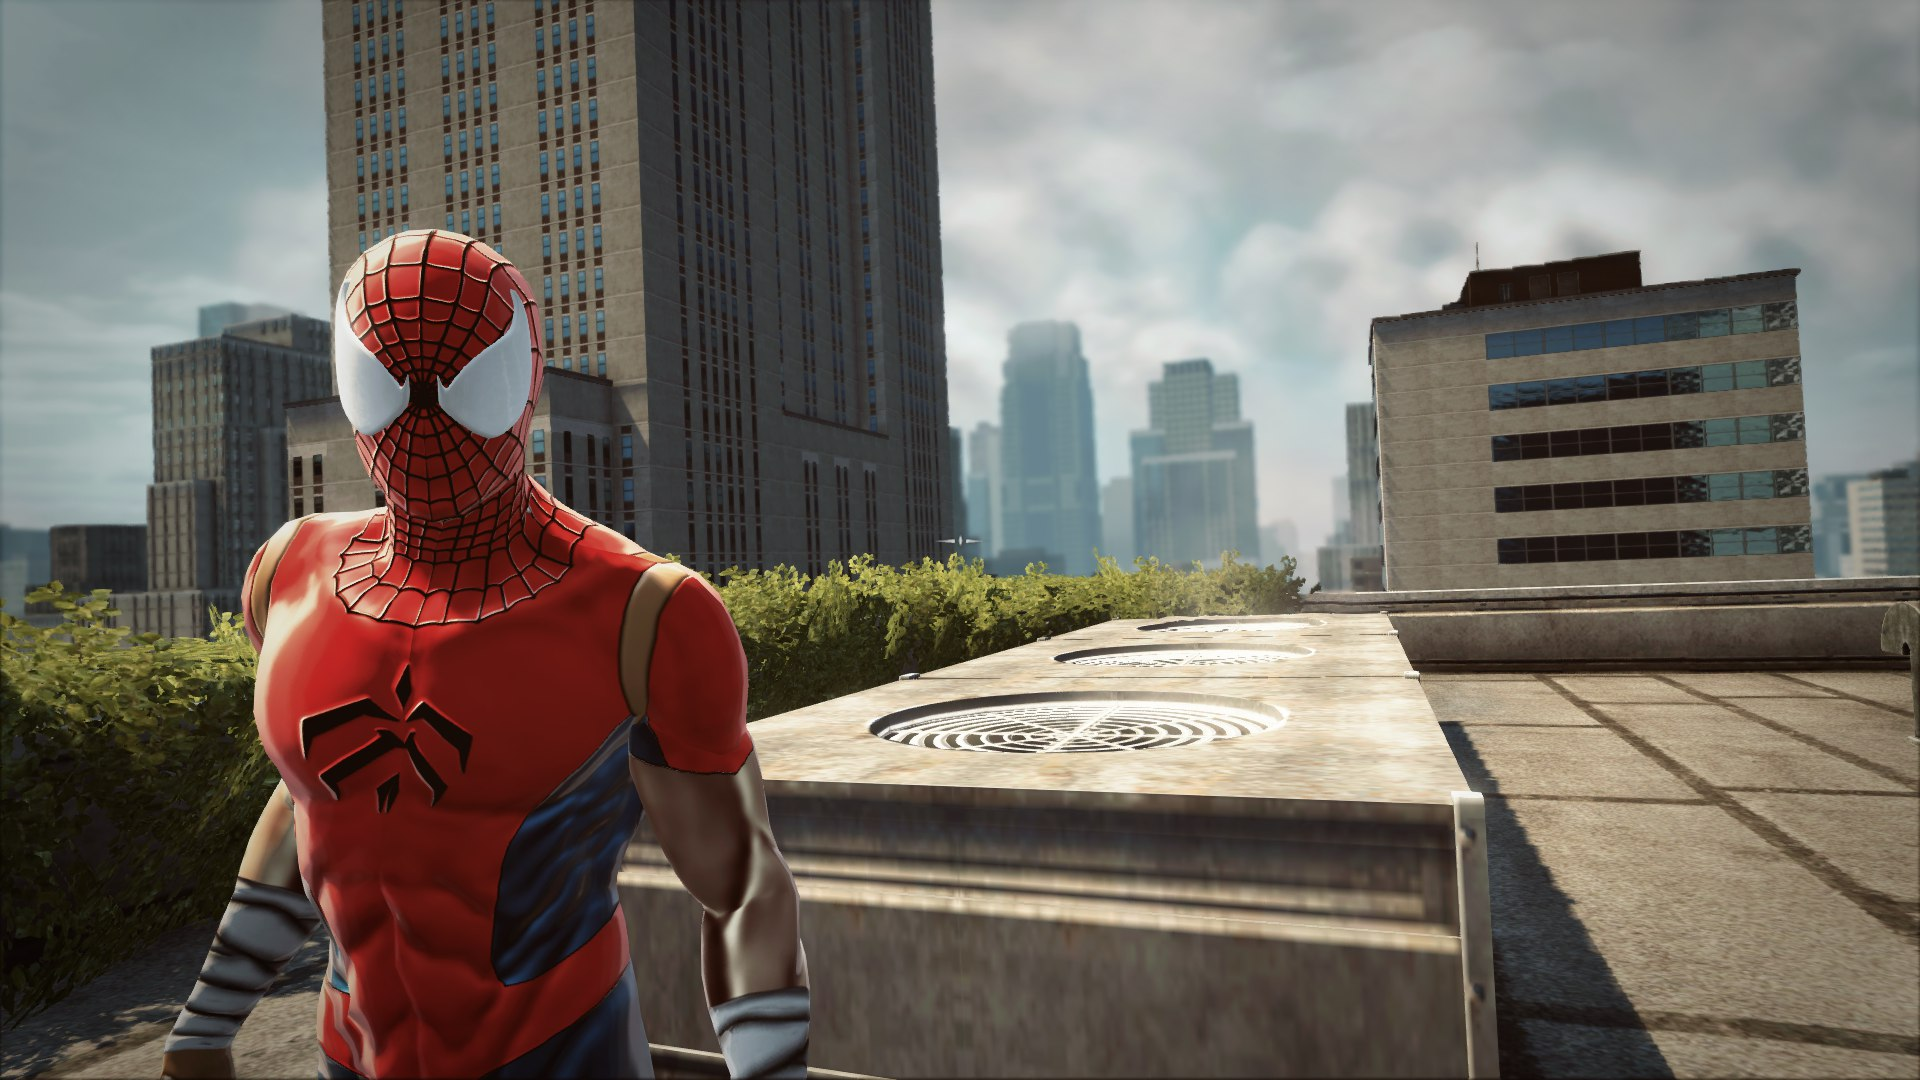 B96WruH7O30.jpg - Amazing Spider-Man, the